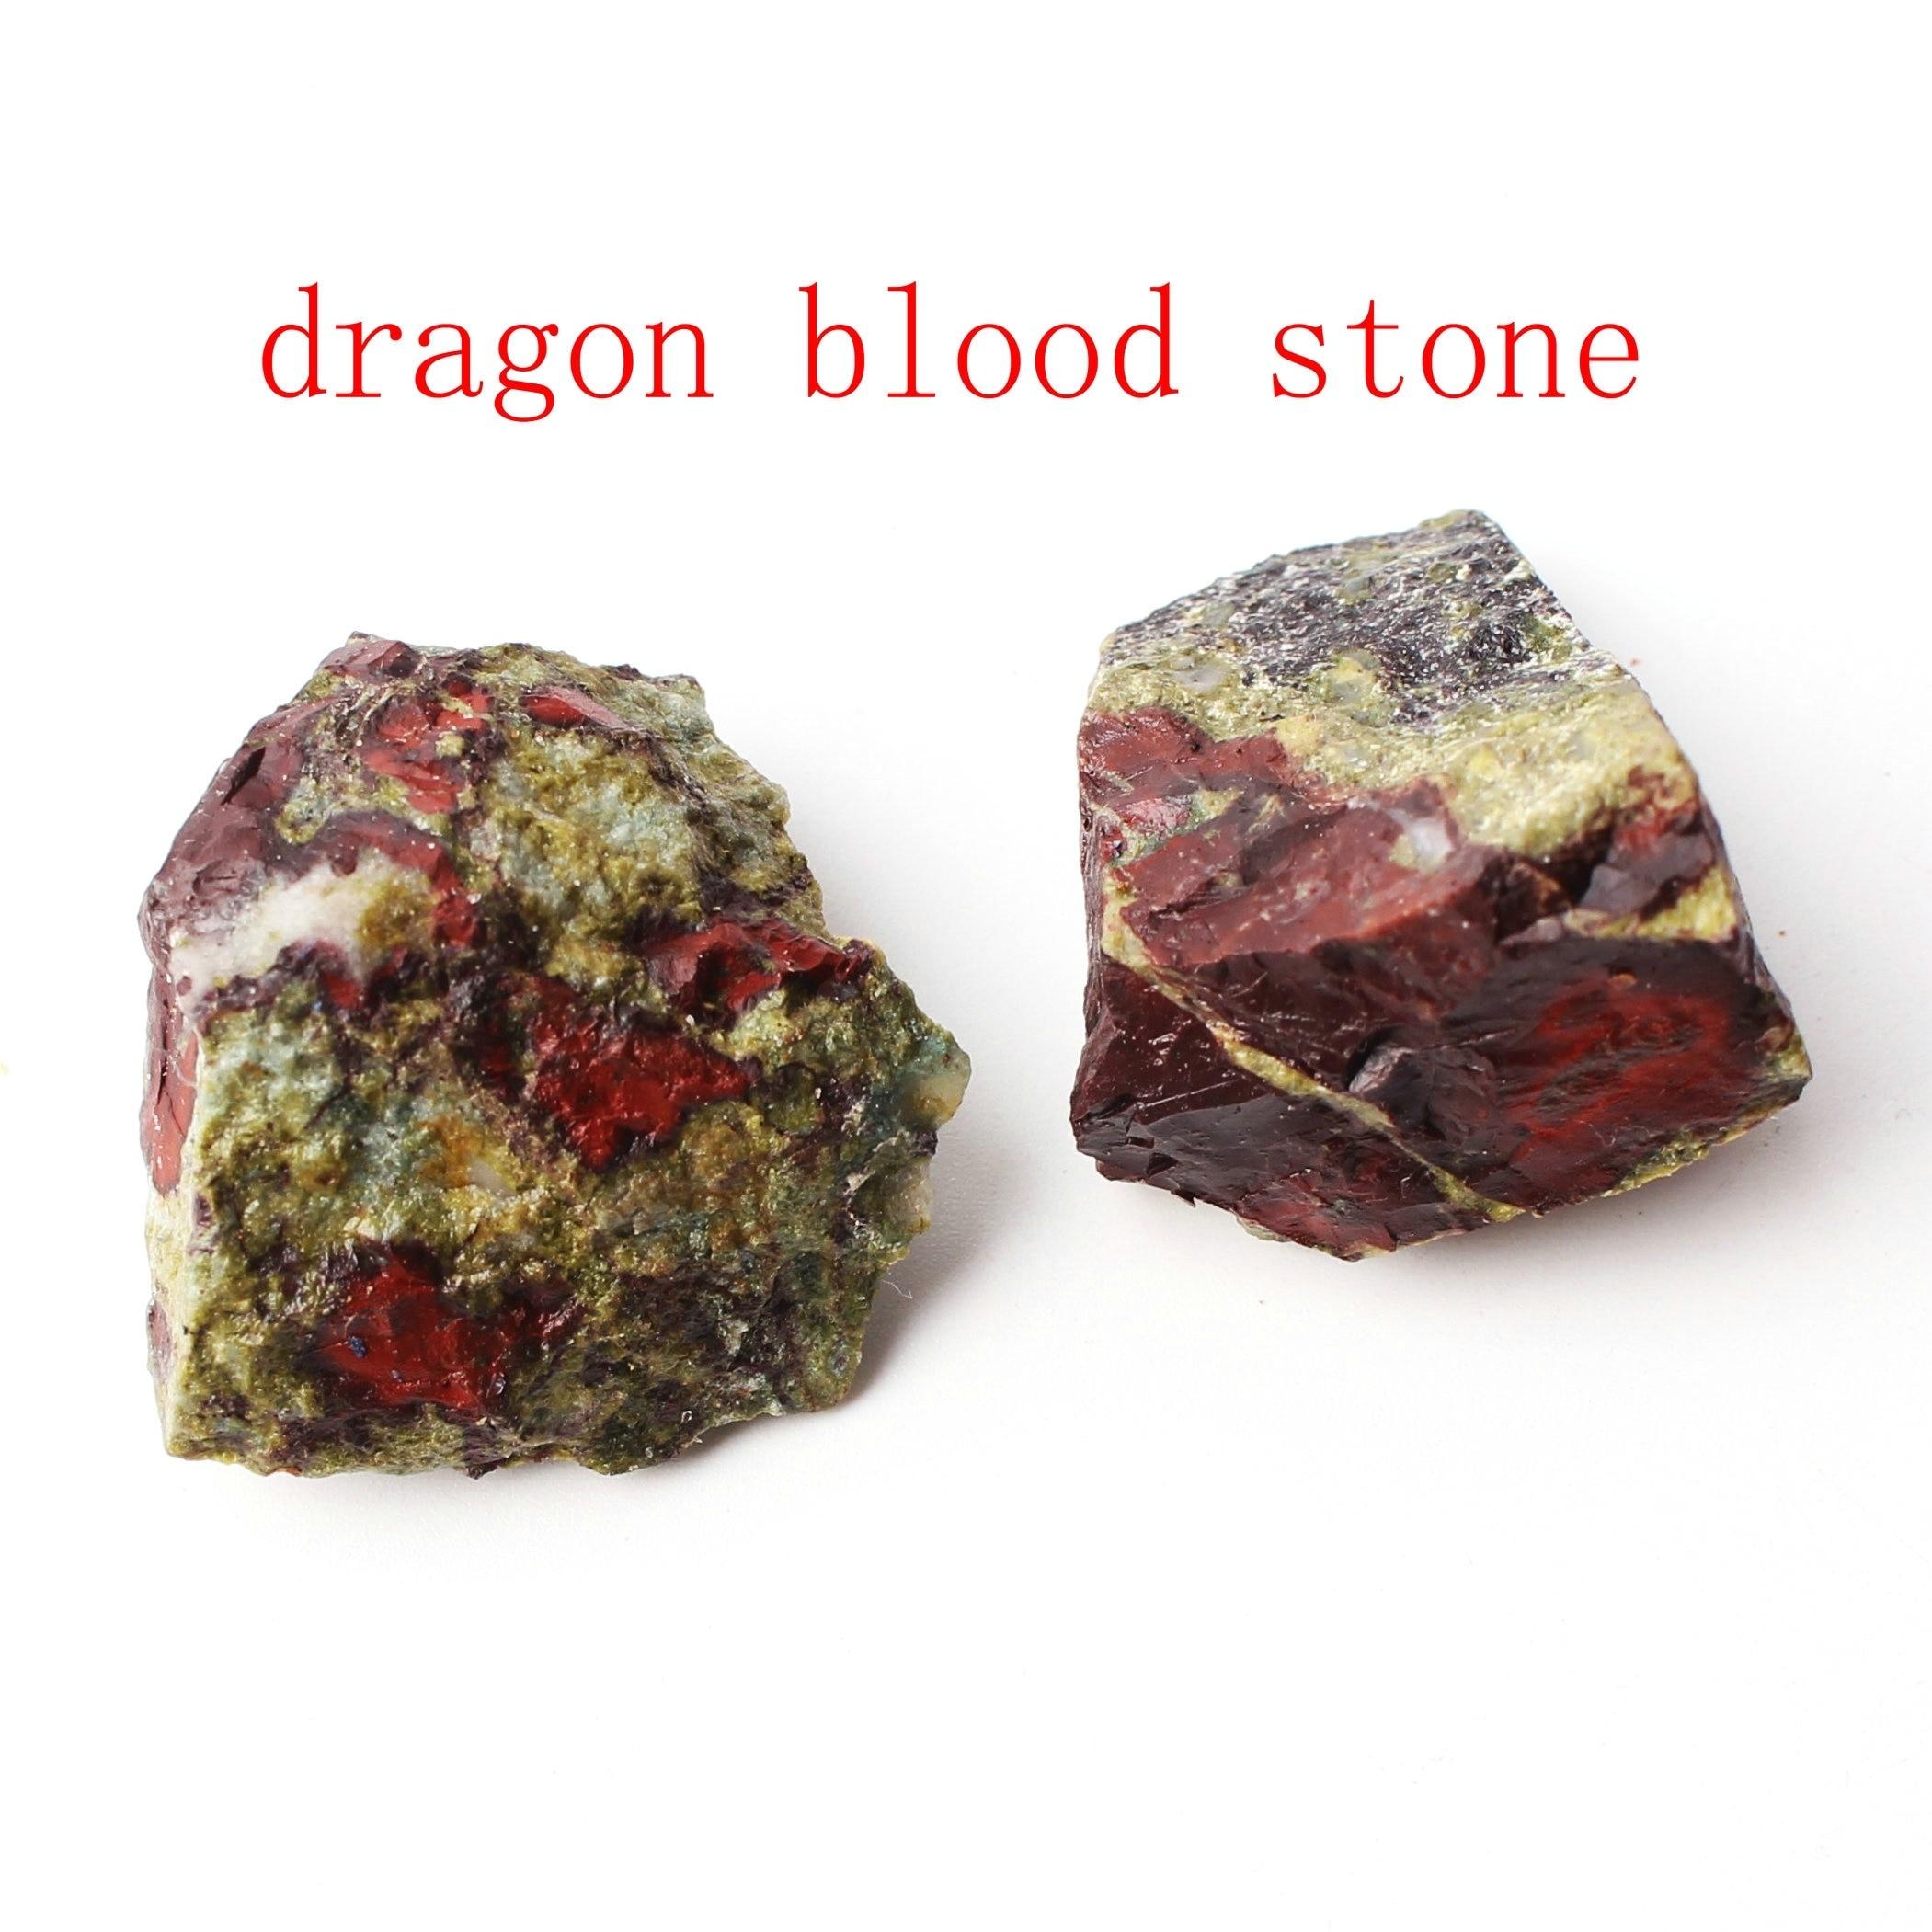 2PC Or More Natural Crystal Quartz Dragon Blood Stone Minerals Specimen Irregular Shape Rough Stone Reiki Healing Home Decor